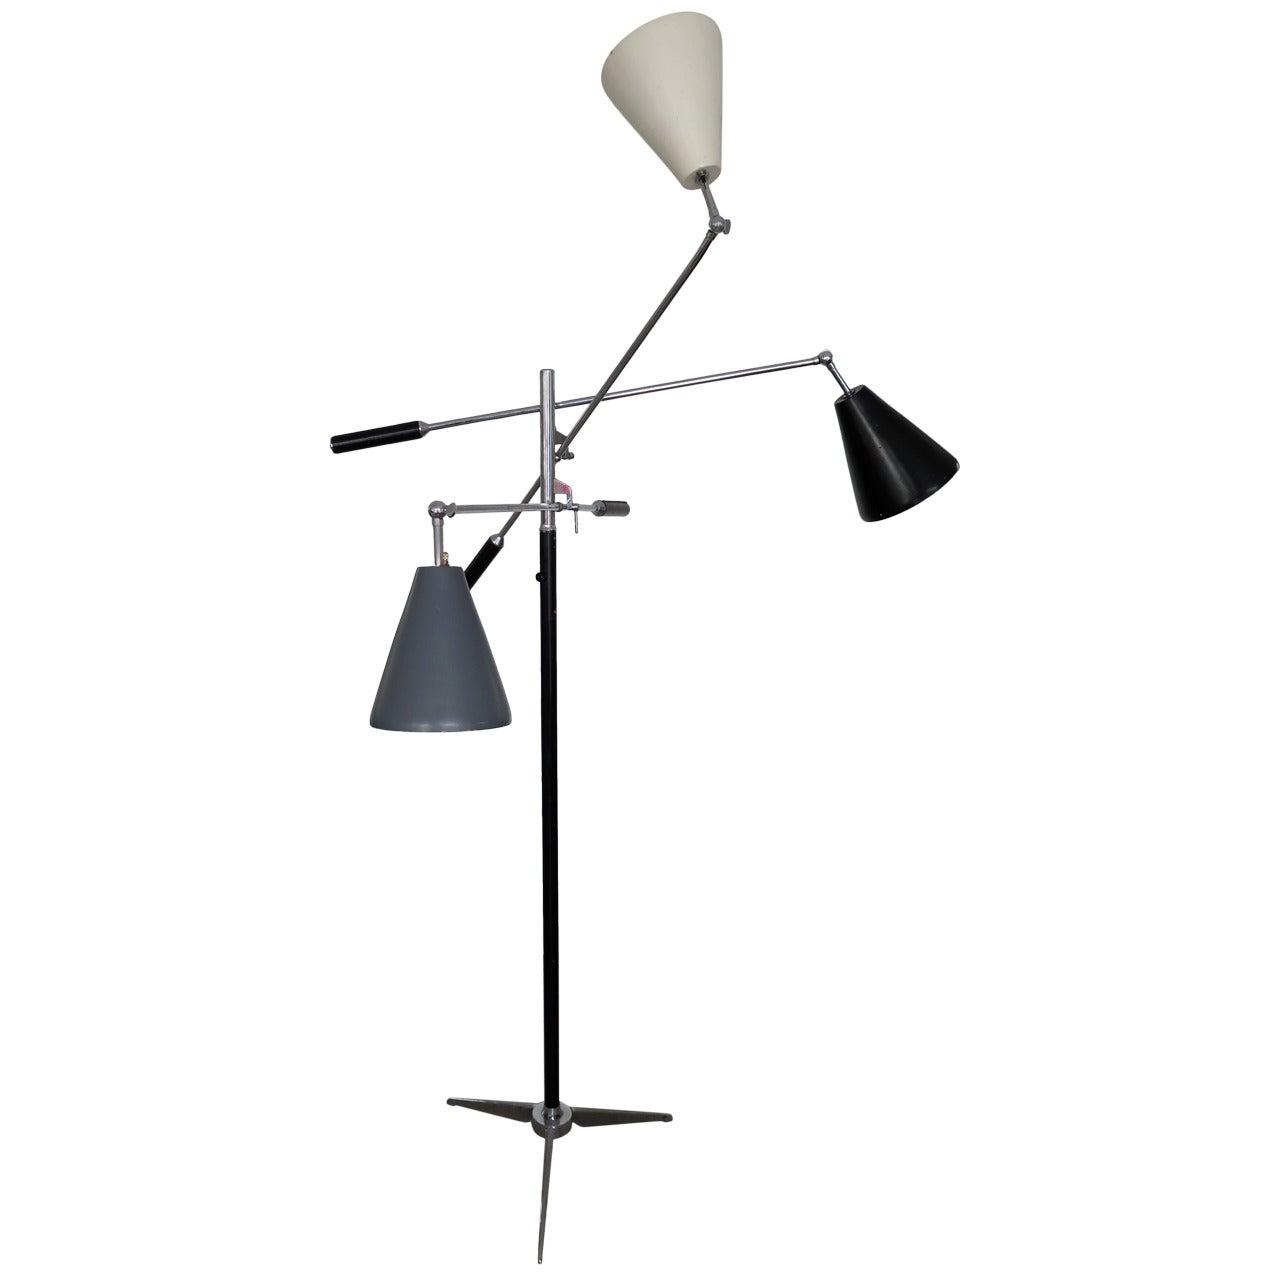 Triennale Style Midcentury Italian Floor Lamp, circa 1960s